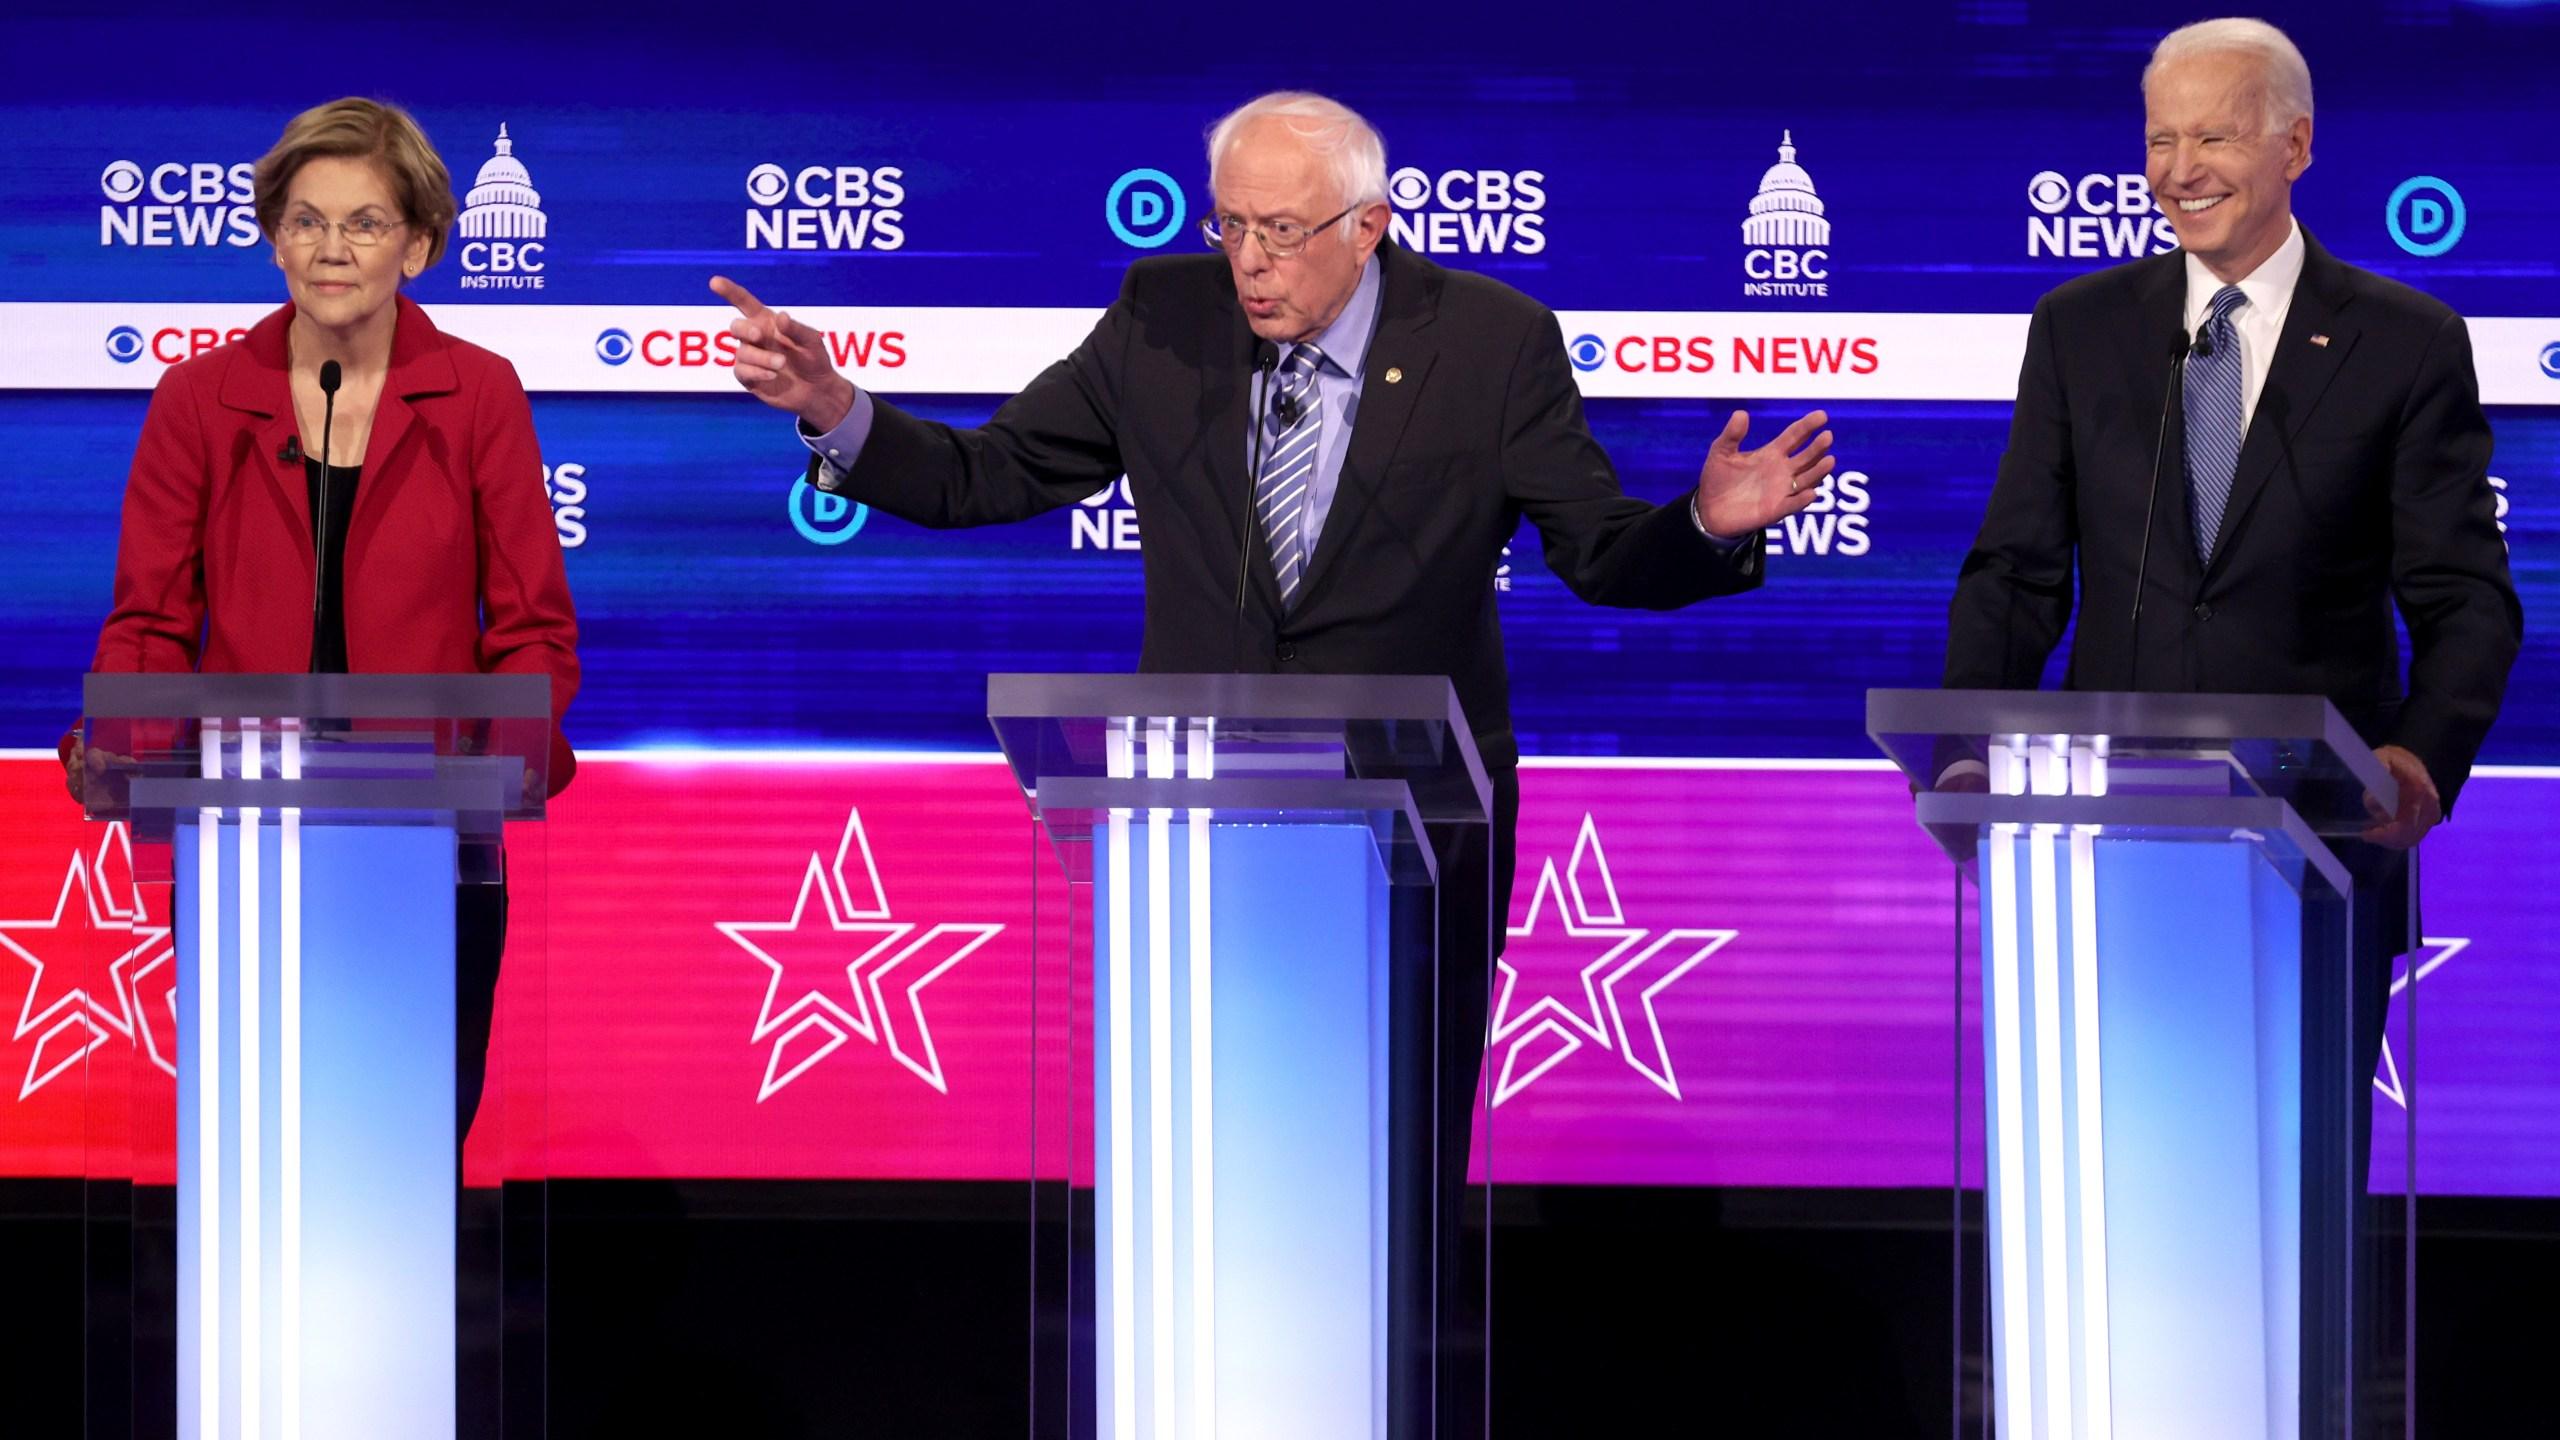 Democratic presidential candidates (L-R) Sen. Elizabeth Warren (D-MA), Sen. Bernie Sanders (I-VT) and former Vice President Joe Biden participate the Democratic presidential primary debate on Feb. 25, 2020 in Charleston, South Carolina. (Win McNamee/Getty Images)